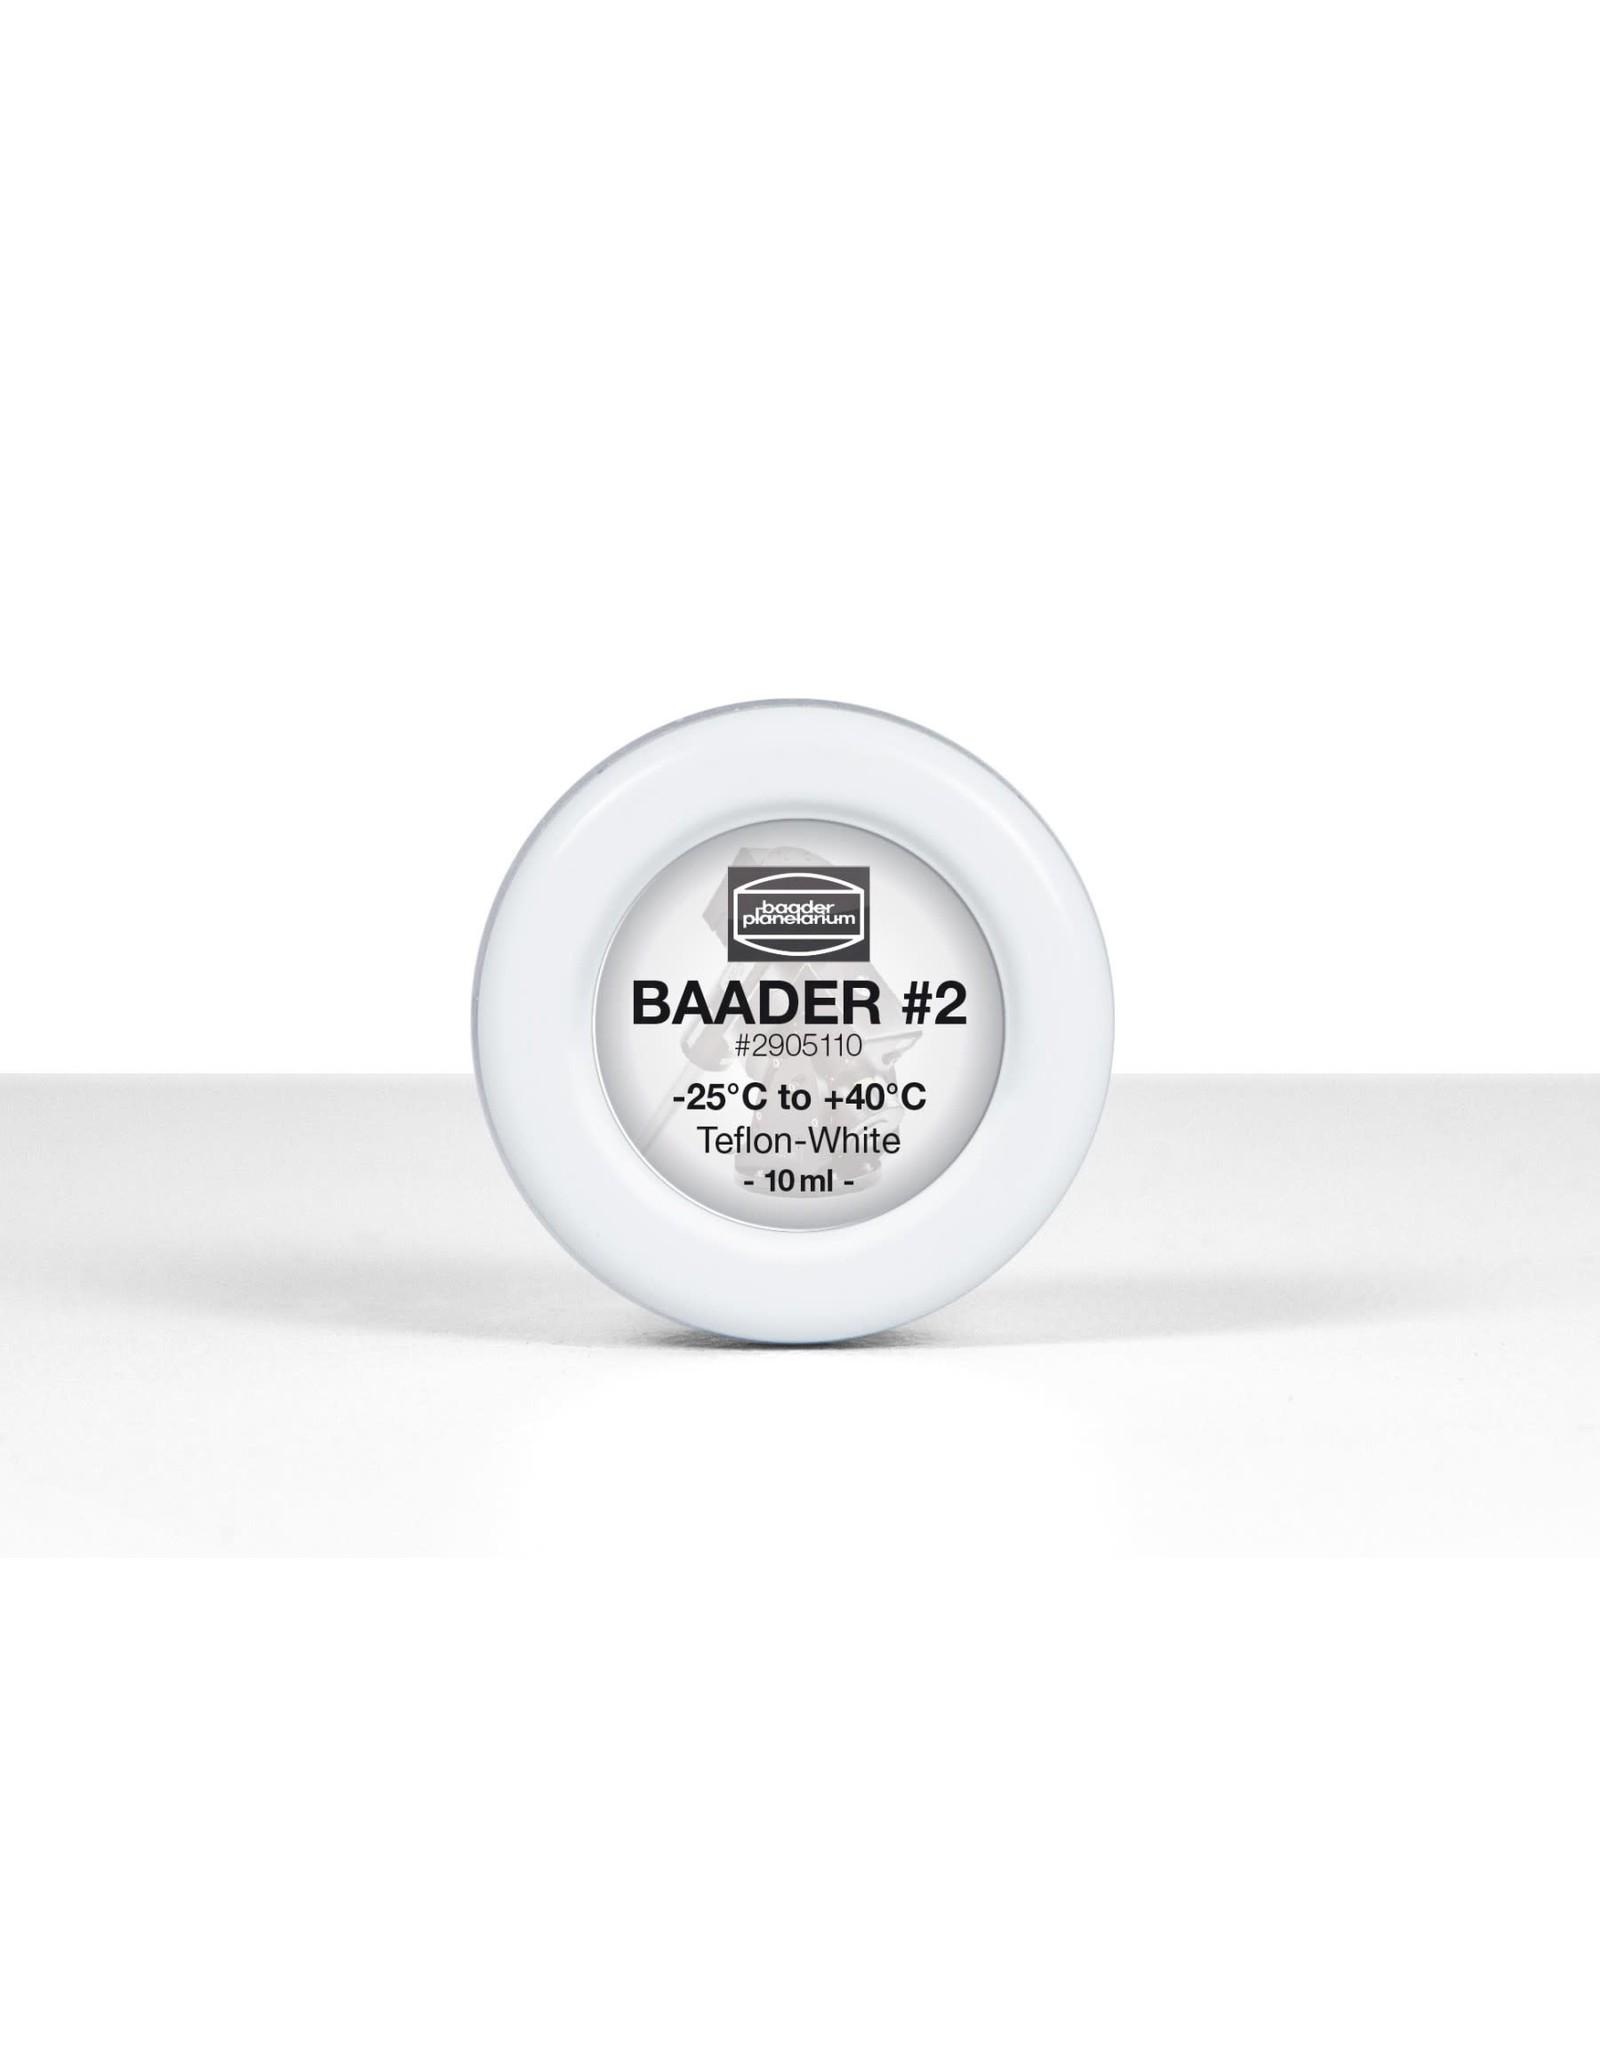 Baader Planetarium Baader Machine-Grease #2 Teflon-White (-25°C–+40°C)